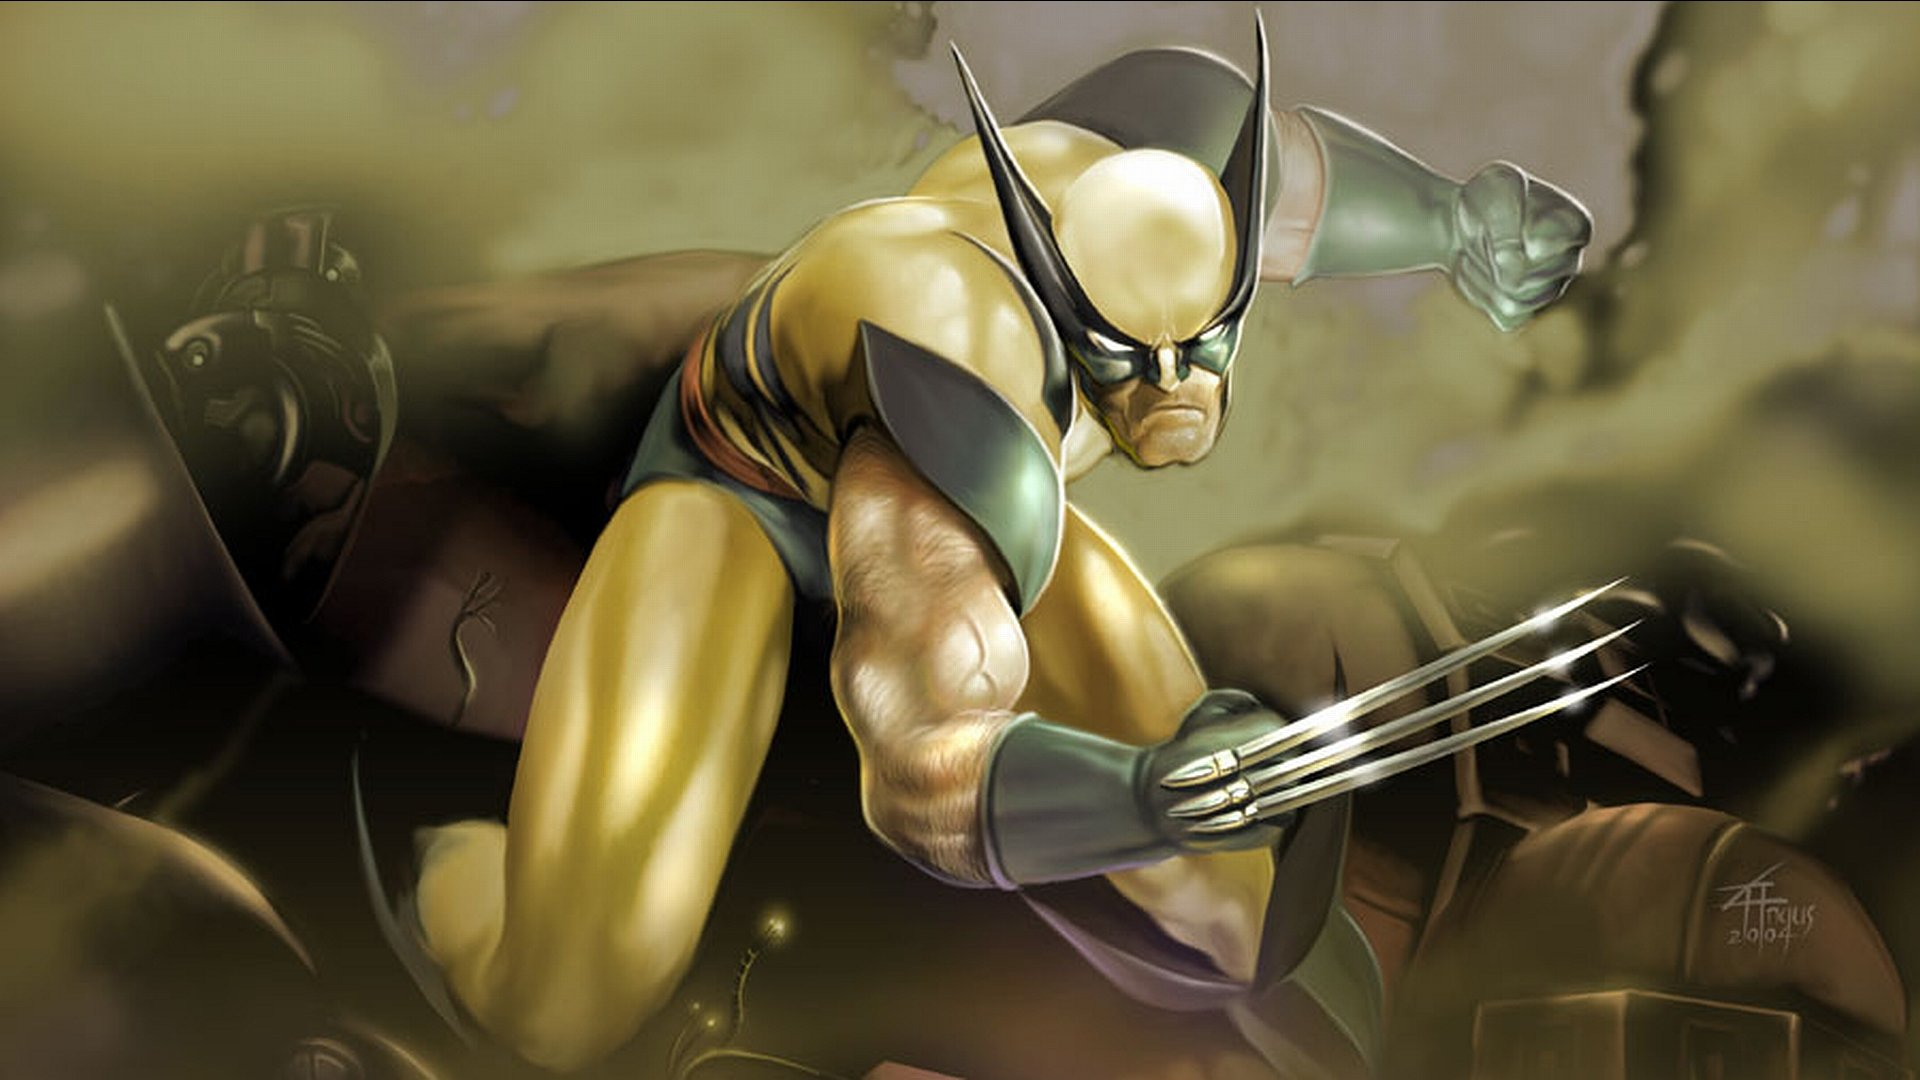 Awesome Wolverine Free Wallpaper Id - Imagens De Wolverine Full Hd - HD Wallpaper